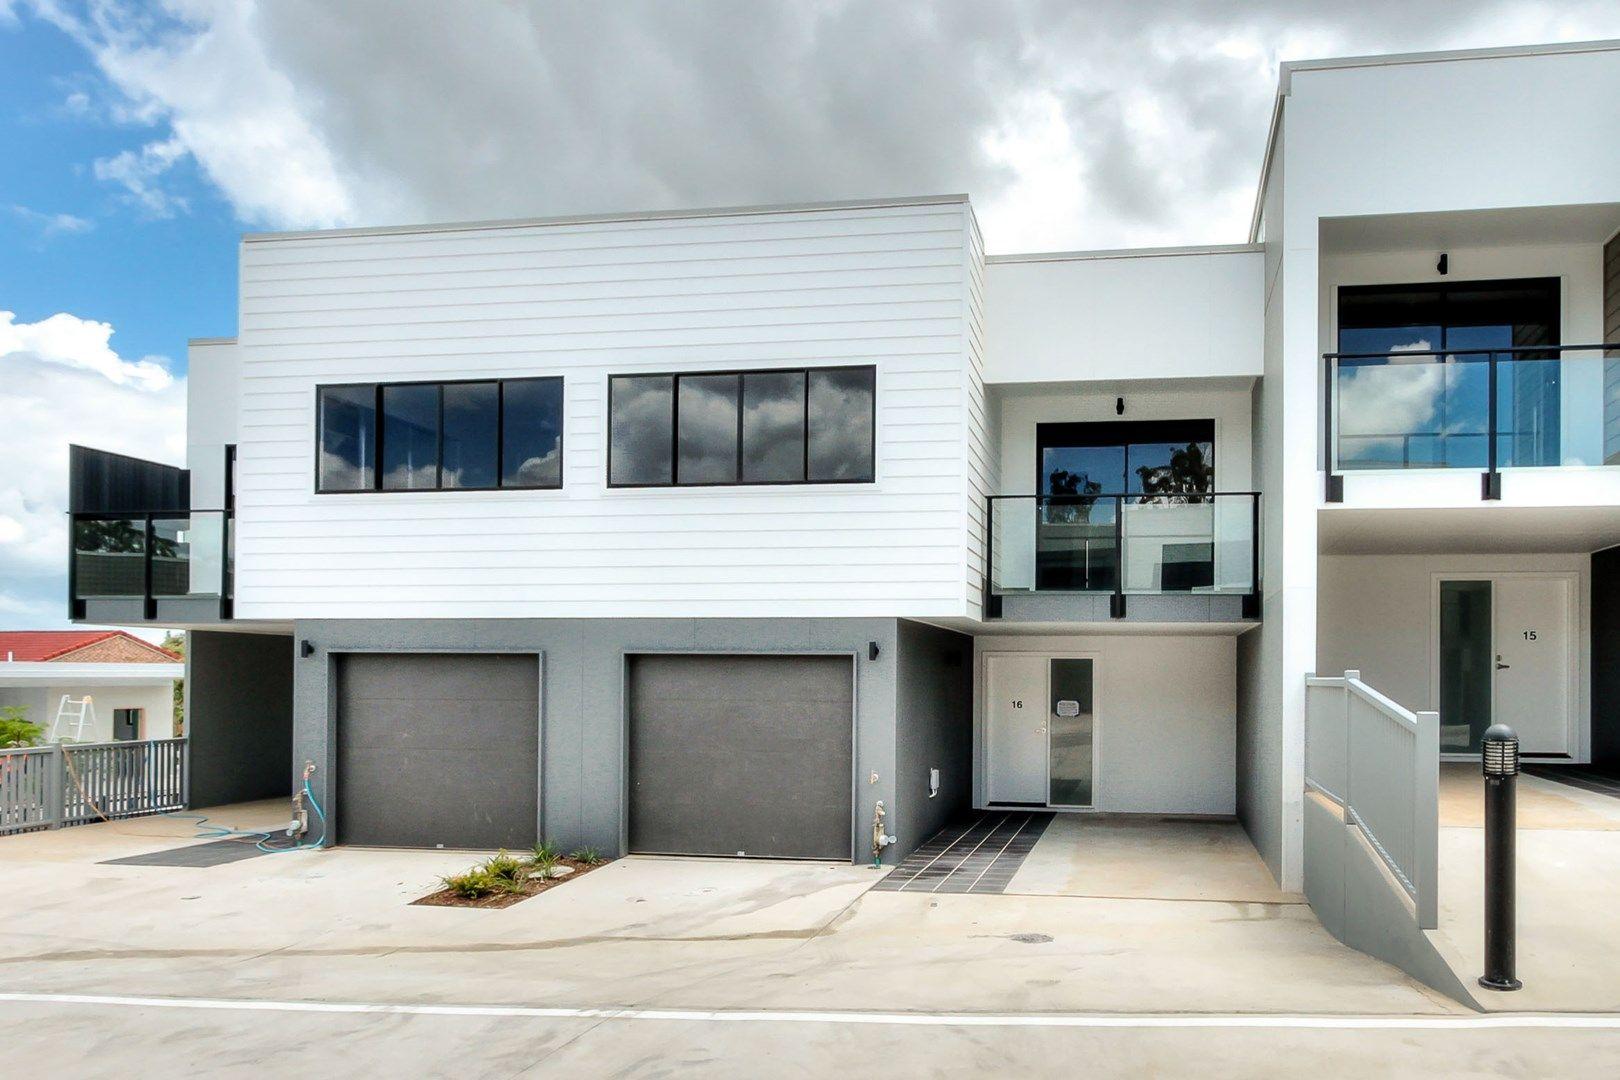 16/105-109 Barbaralla Drive, Springwood QLD 4127, Image 0